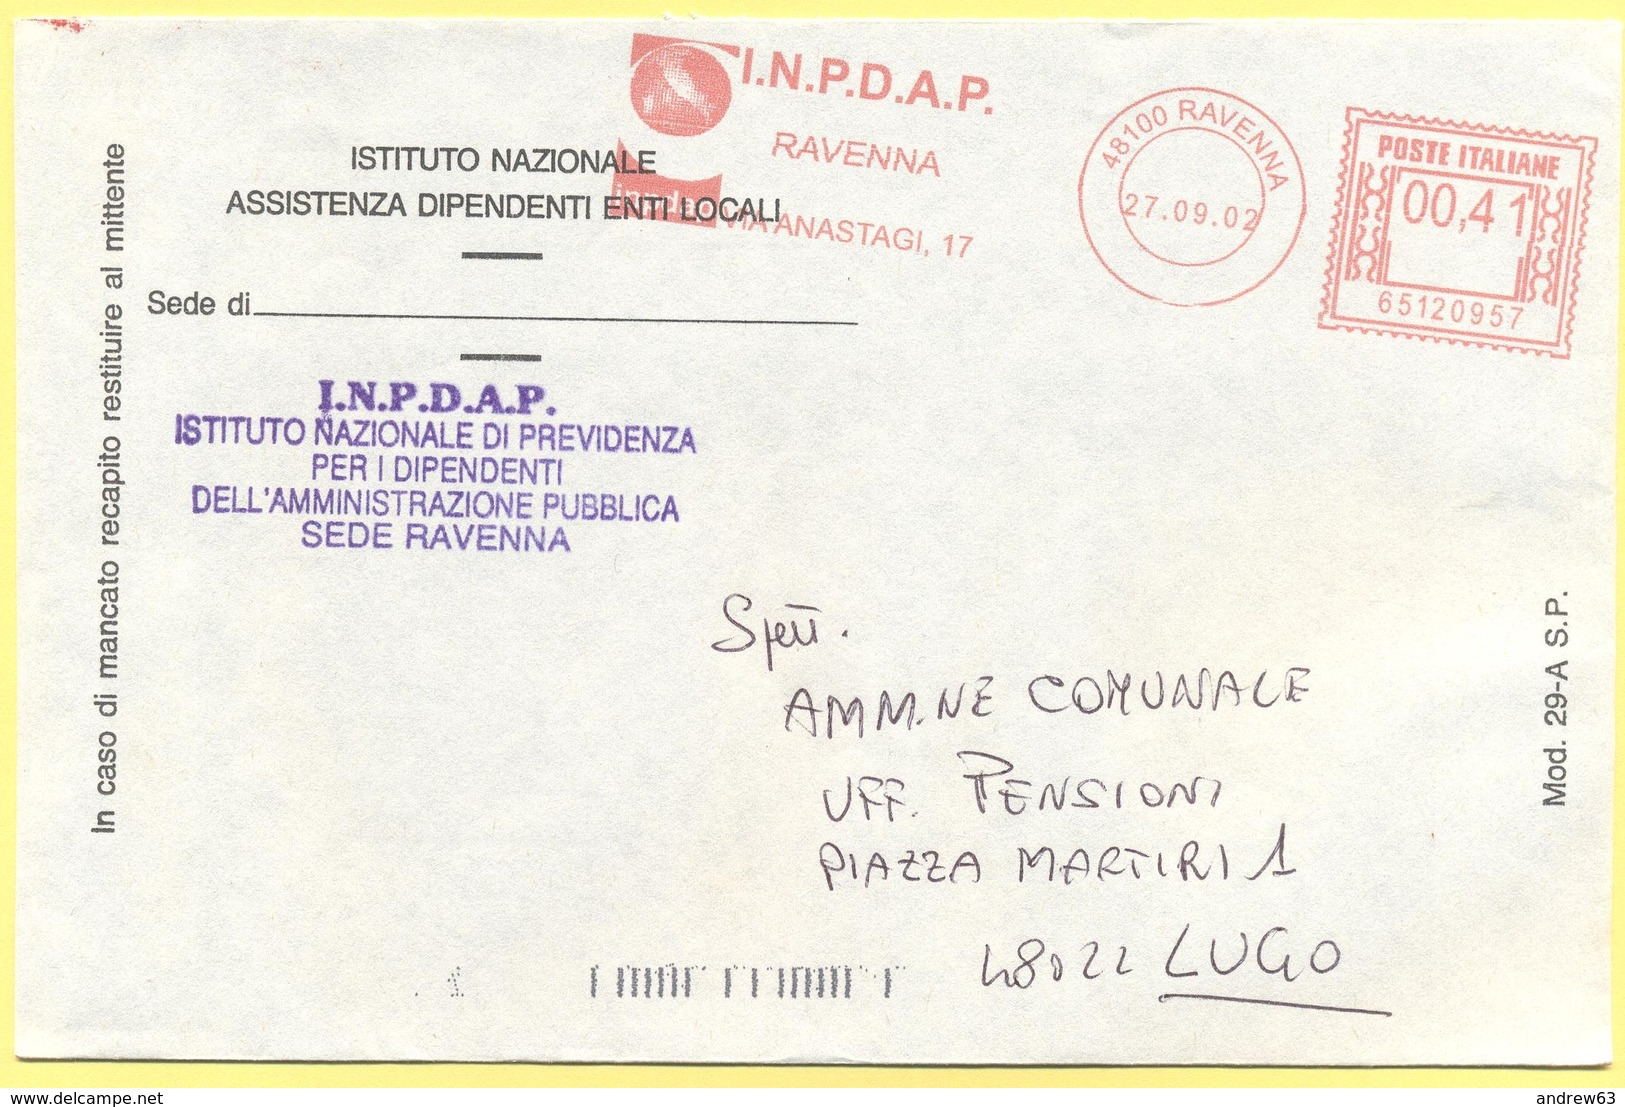 ITALIA - ITALY - ITALIE - 2002 - 00,41€ EMA, Red Cancel - INPDAP - Viaggiata Da Ravenna Per Lugo - Affrancature Meccaniche Rosse (EMA)